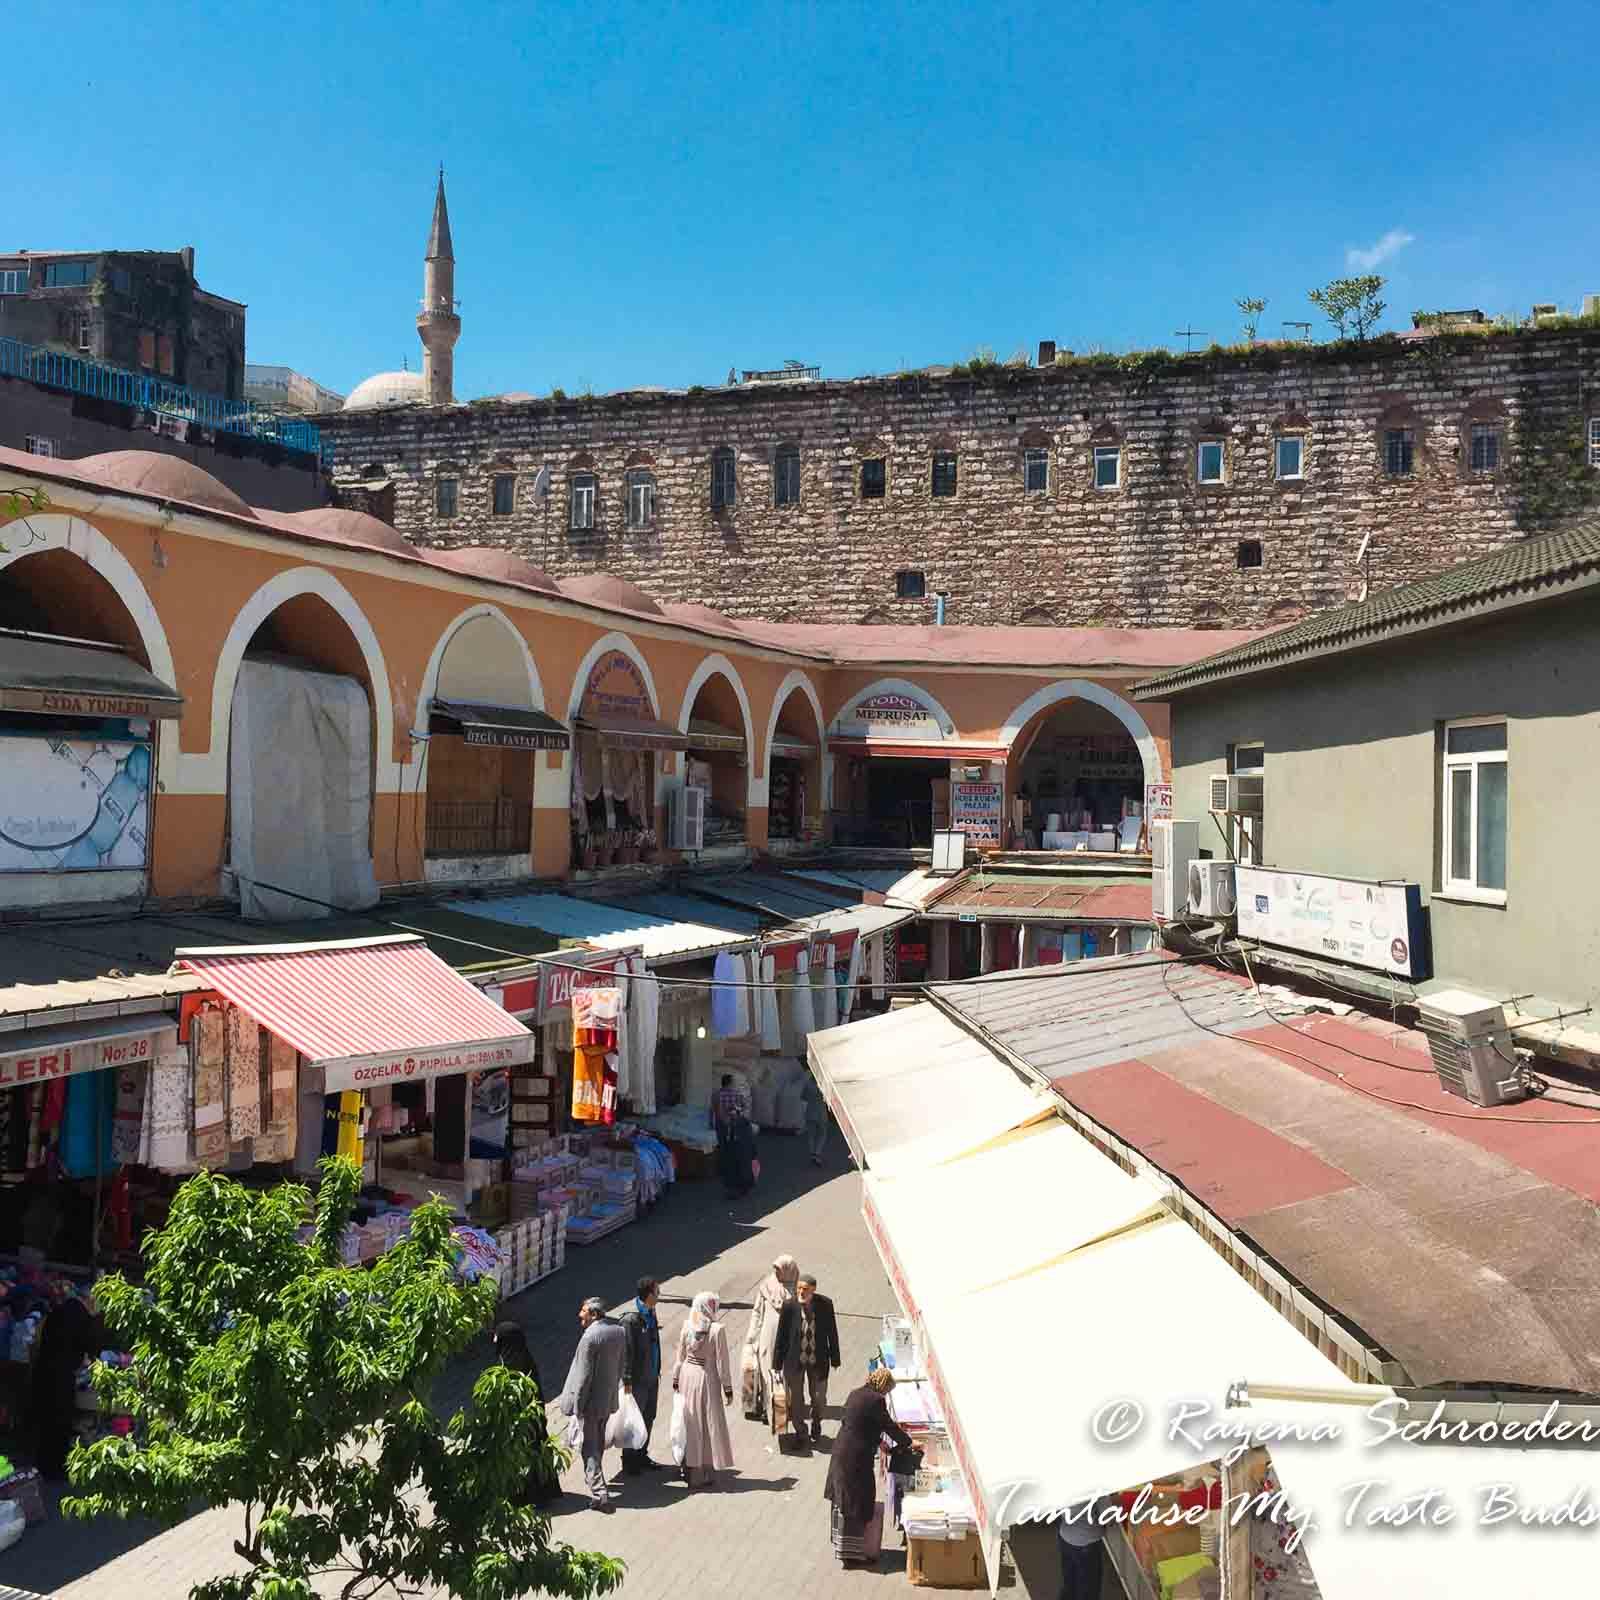 Istanbul Backstreets of the Bazaar Quarter